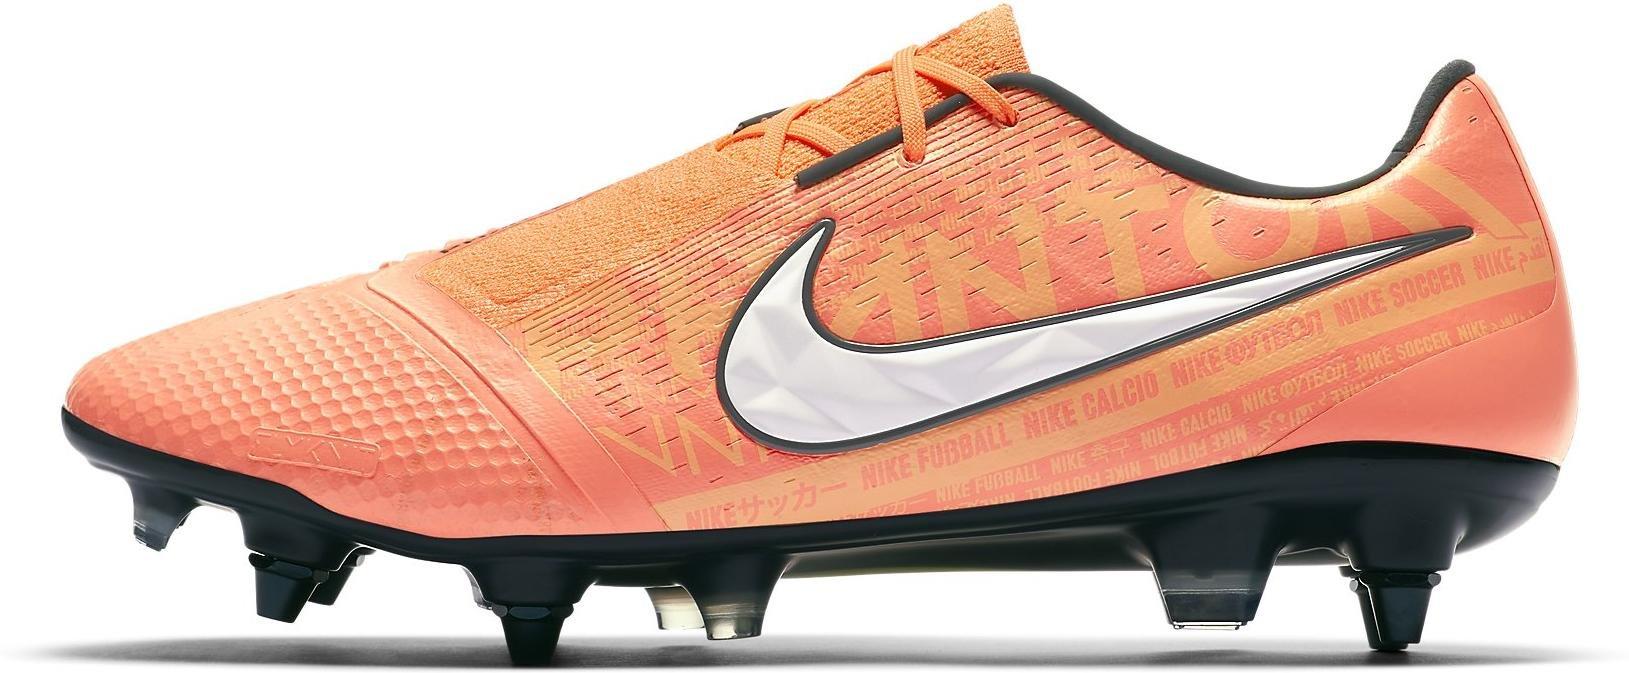 Chaussures de football Nike PHANTOM VENOM ELITE SG PRO AC